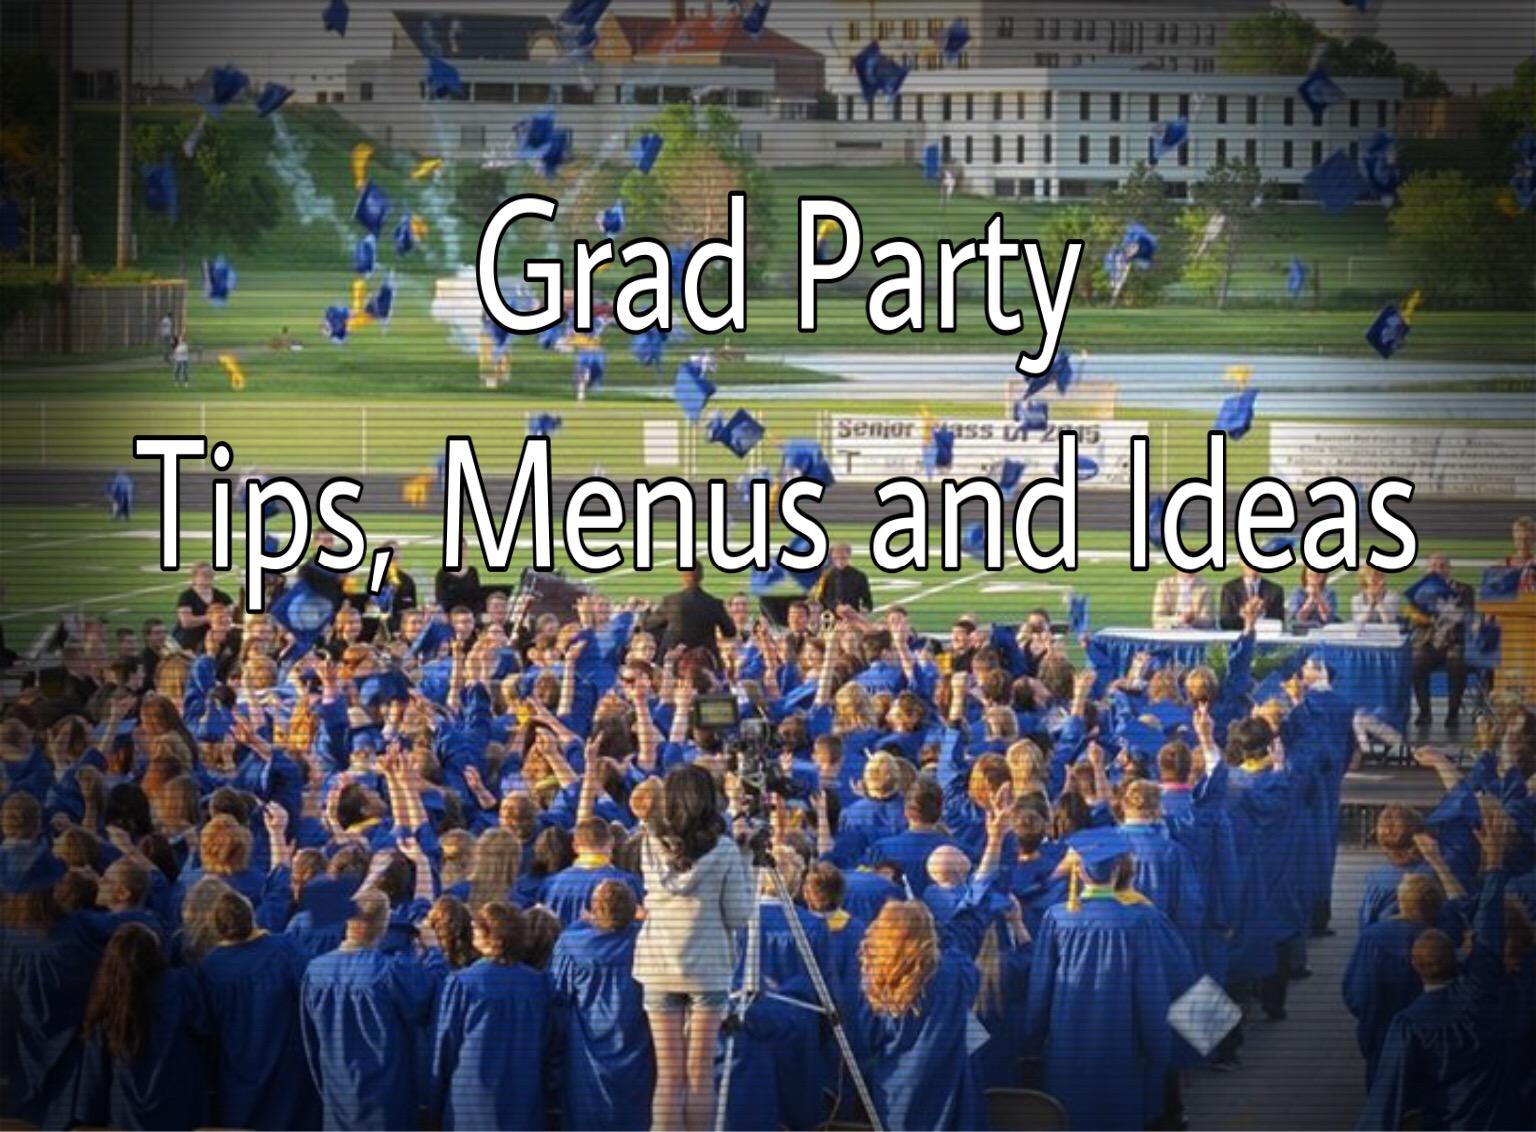 Graduation Party Tips, Menus and ideas